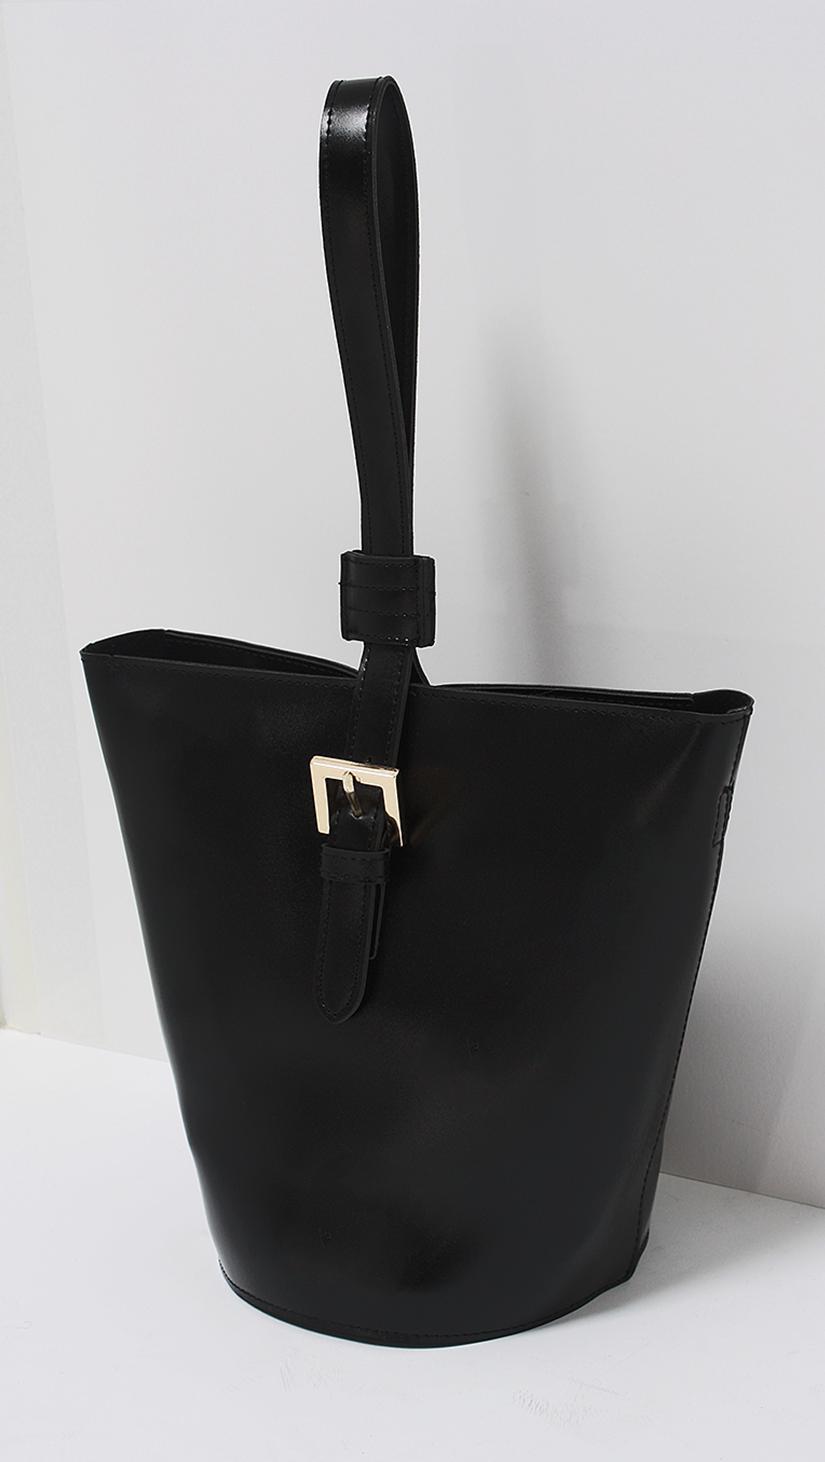 topas_bucket_bag_black_2.png